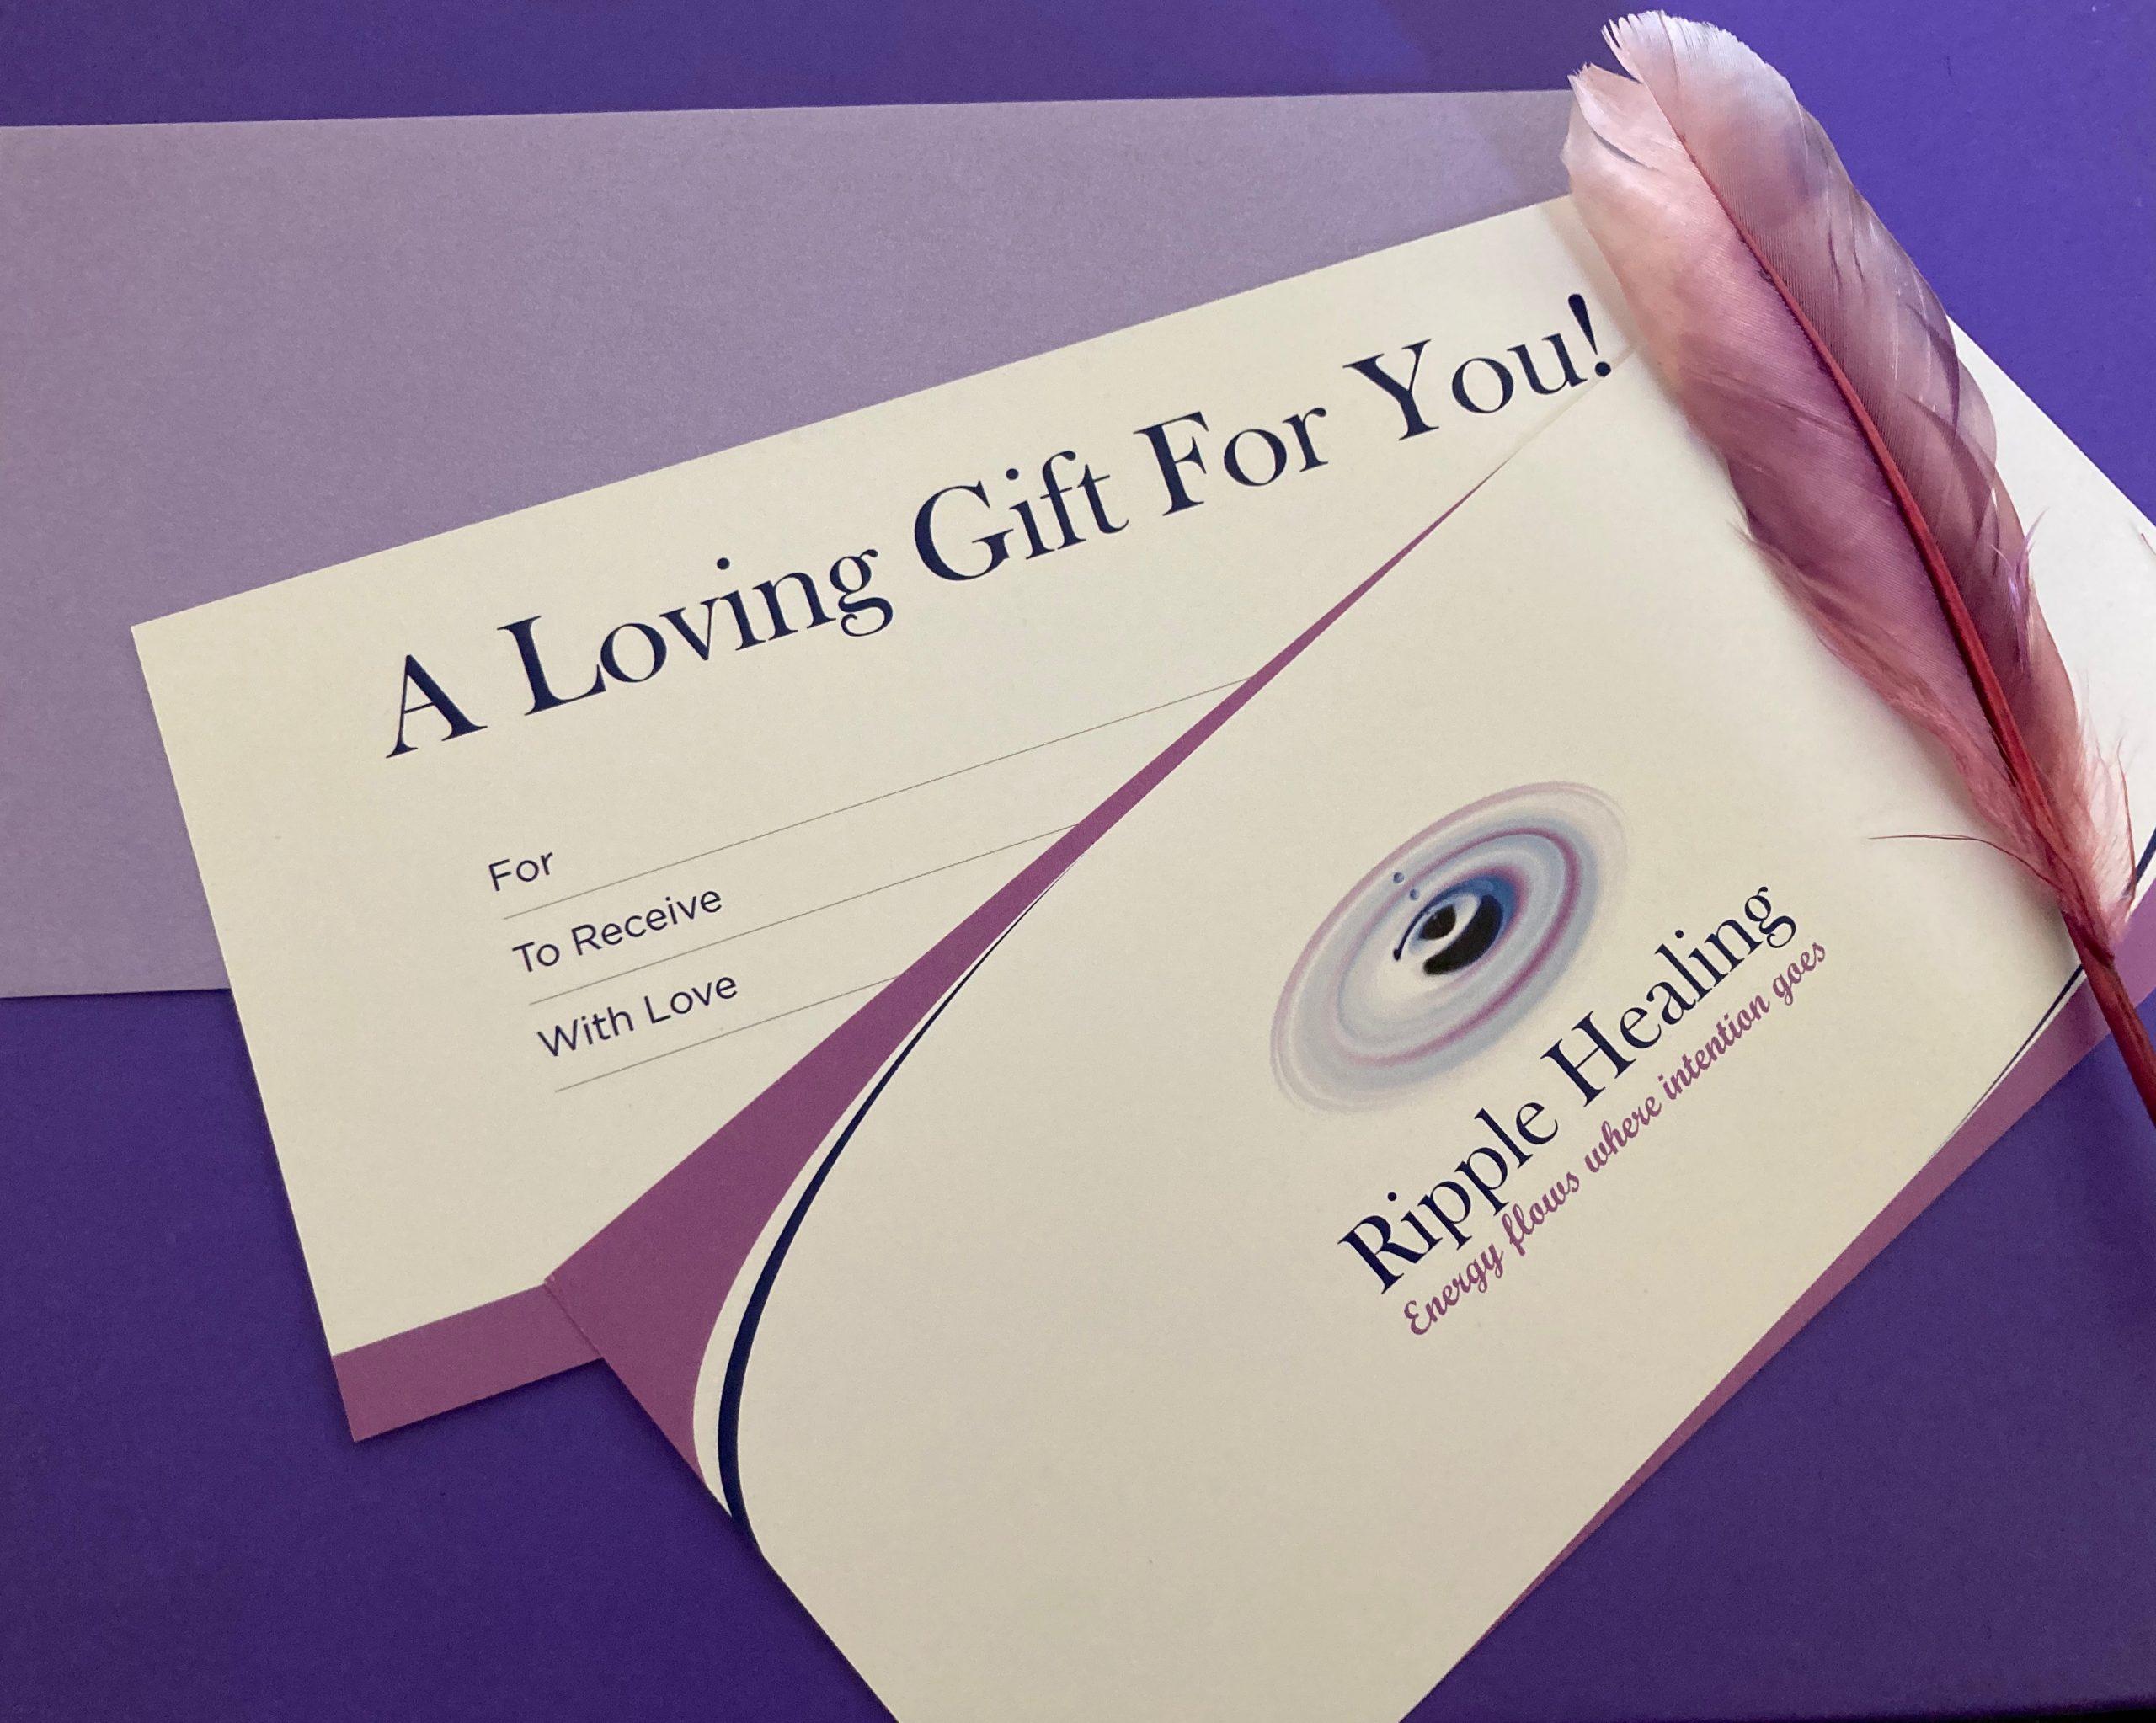 Energy Healing Voucher   Gifts of Healing   Pranic Energy Healing   Ripple Healing